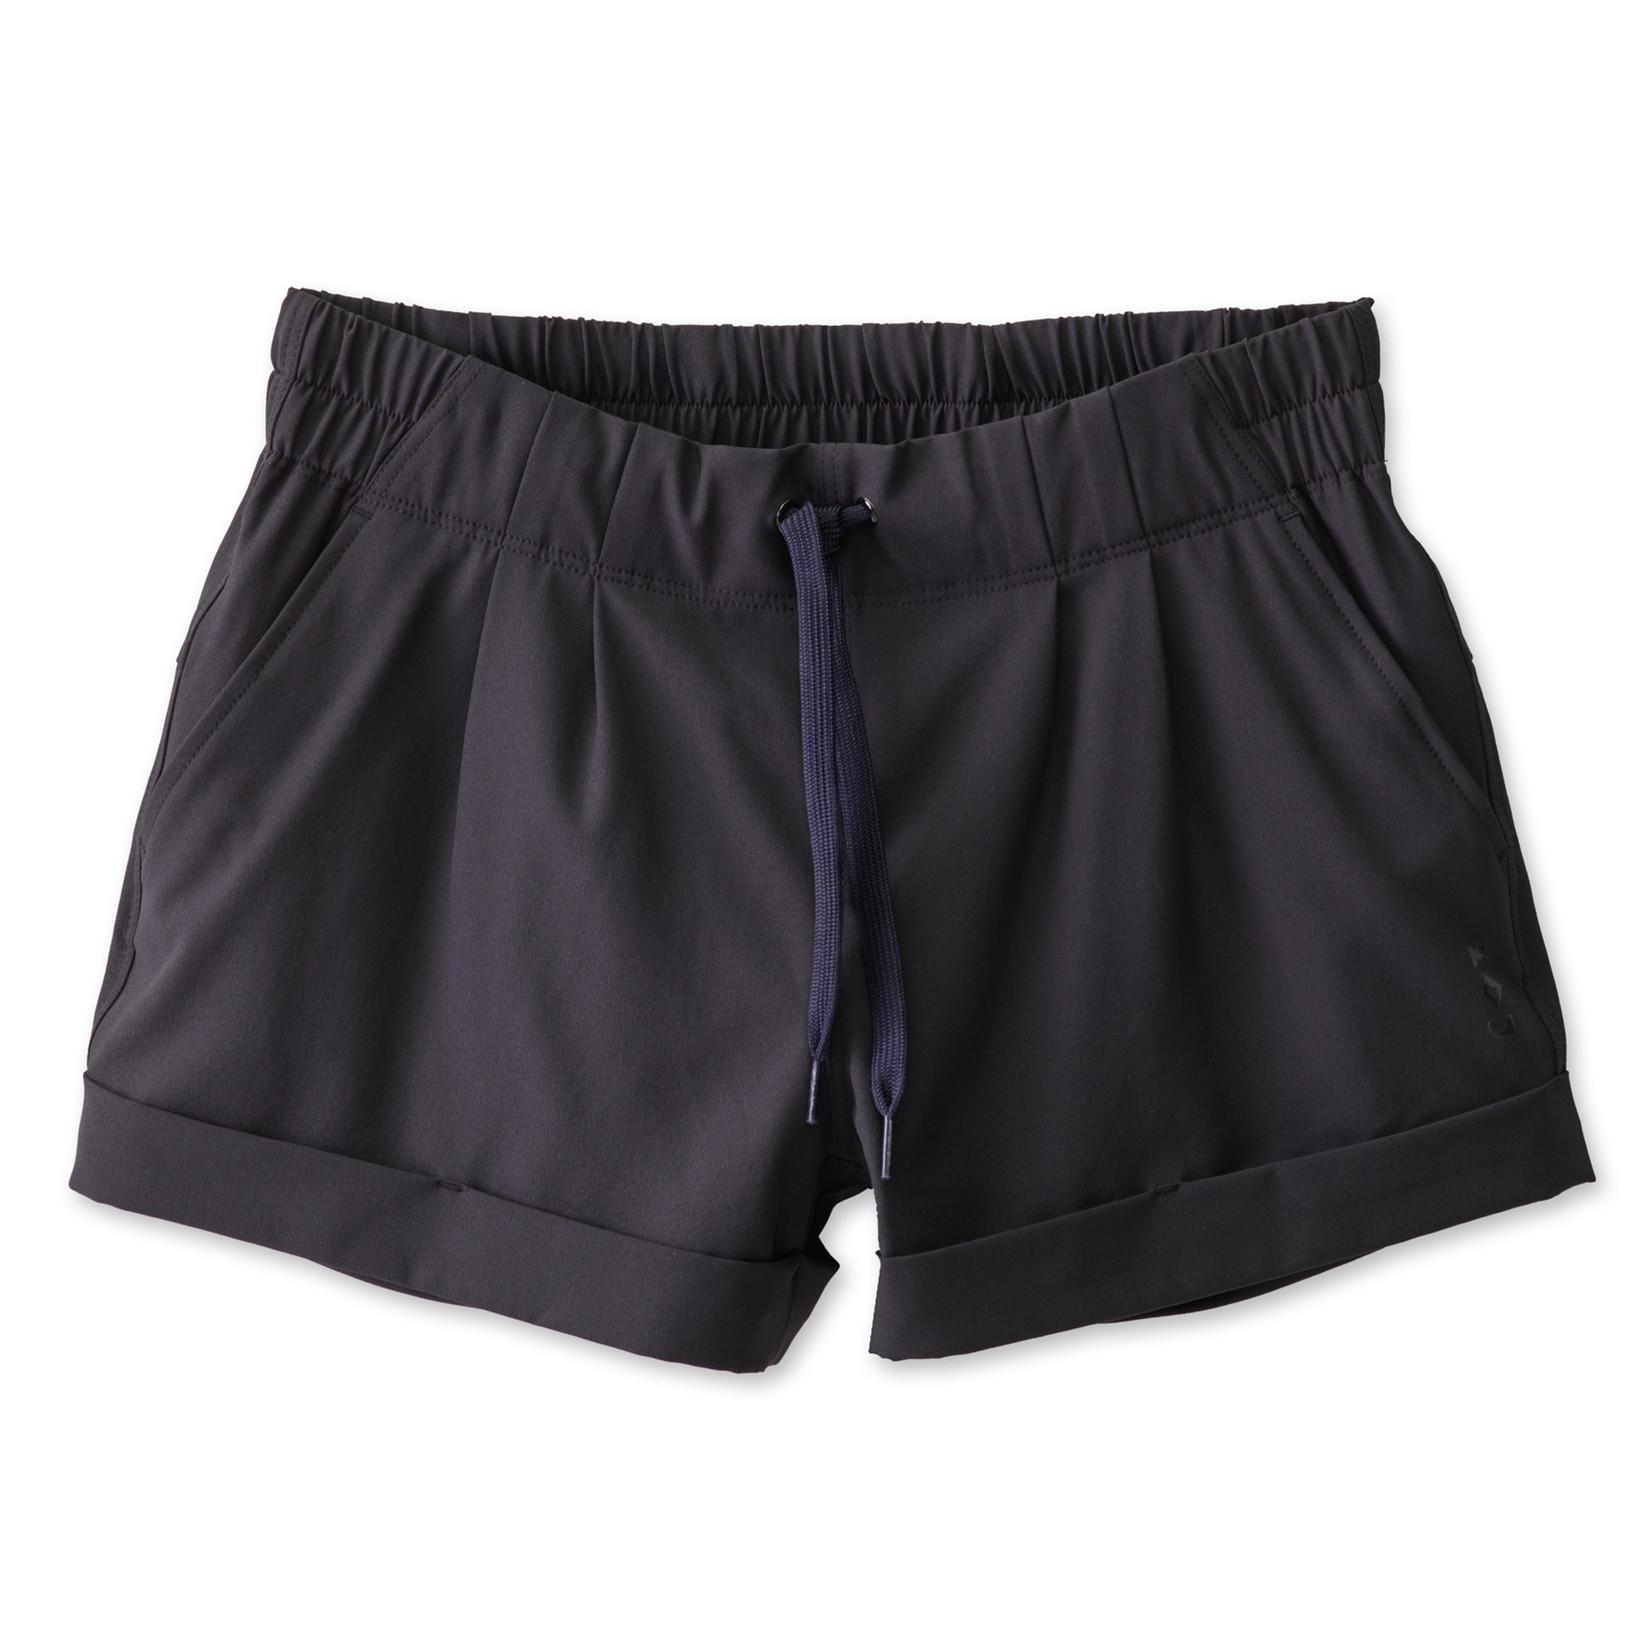 Kavu Kavu Women's Tepic Shorts